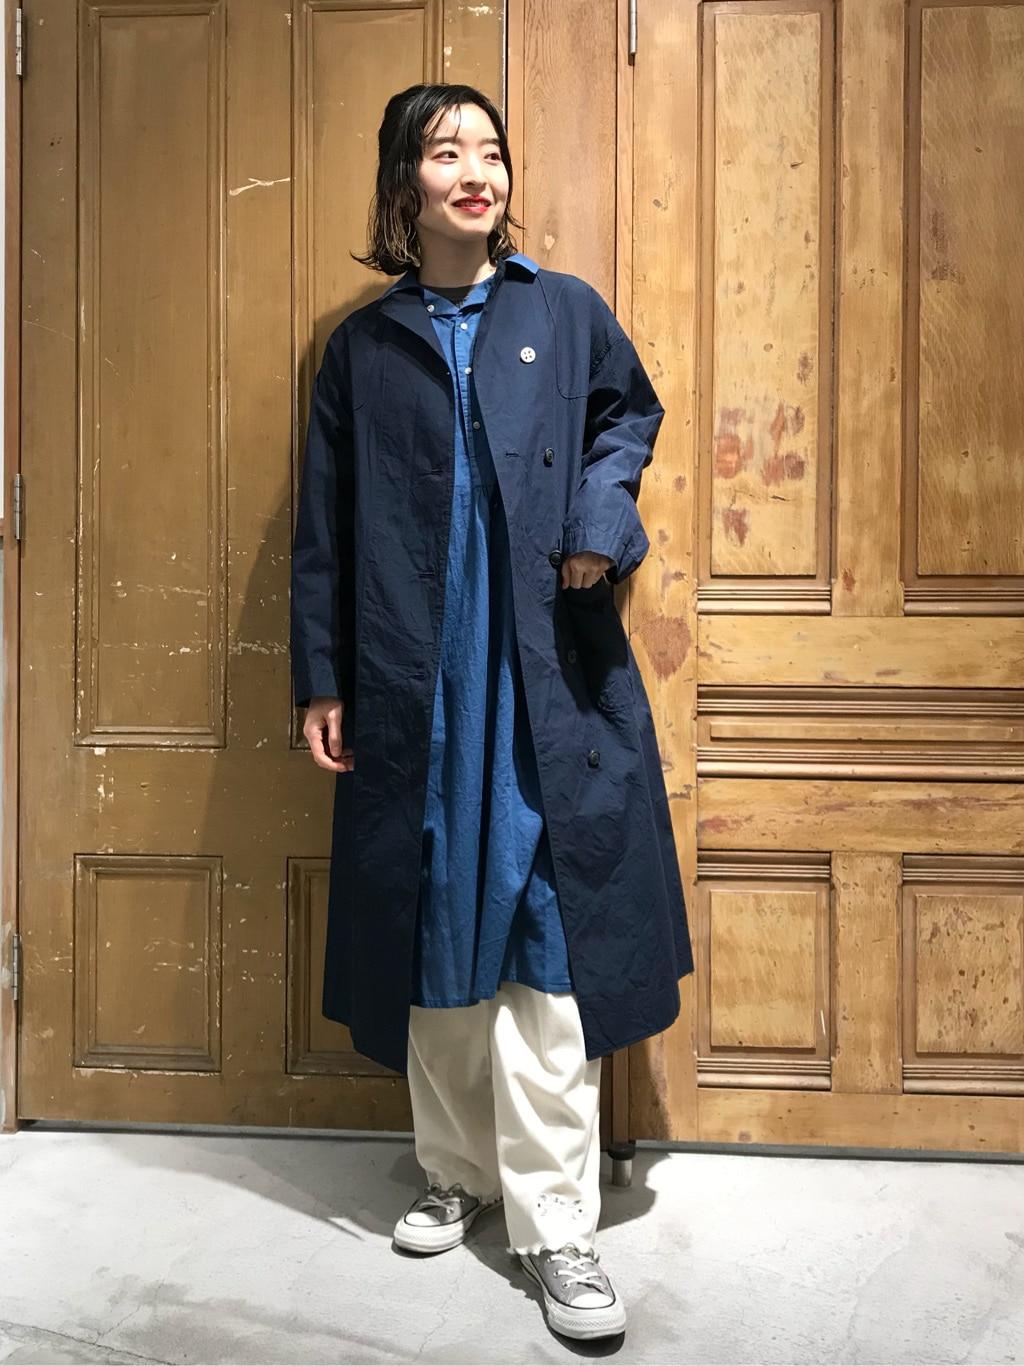 Malle chambre de charme ルミネ新宿 身長:164cm 2021.01.30